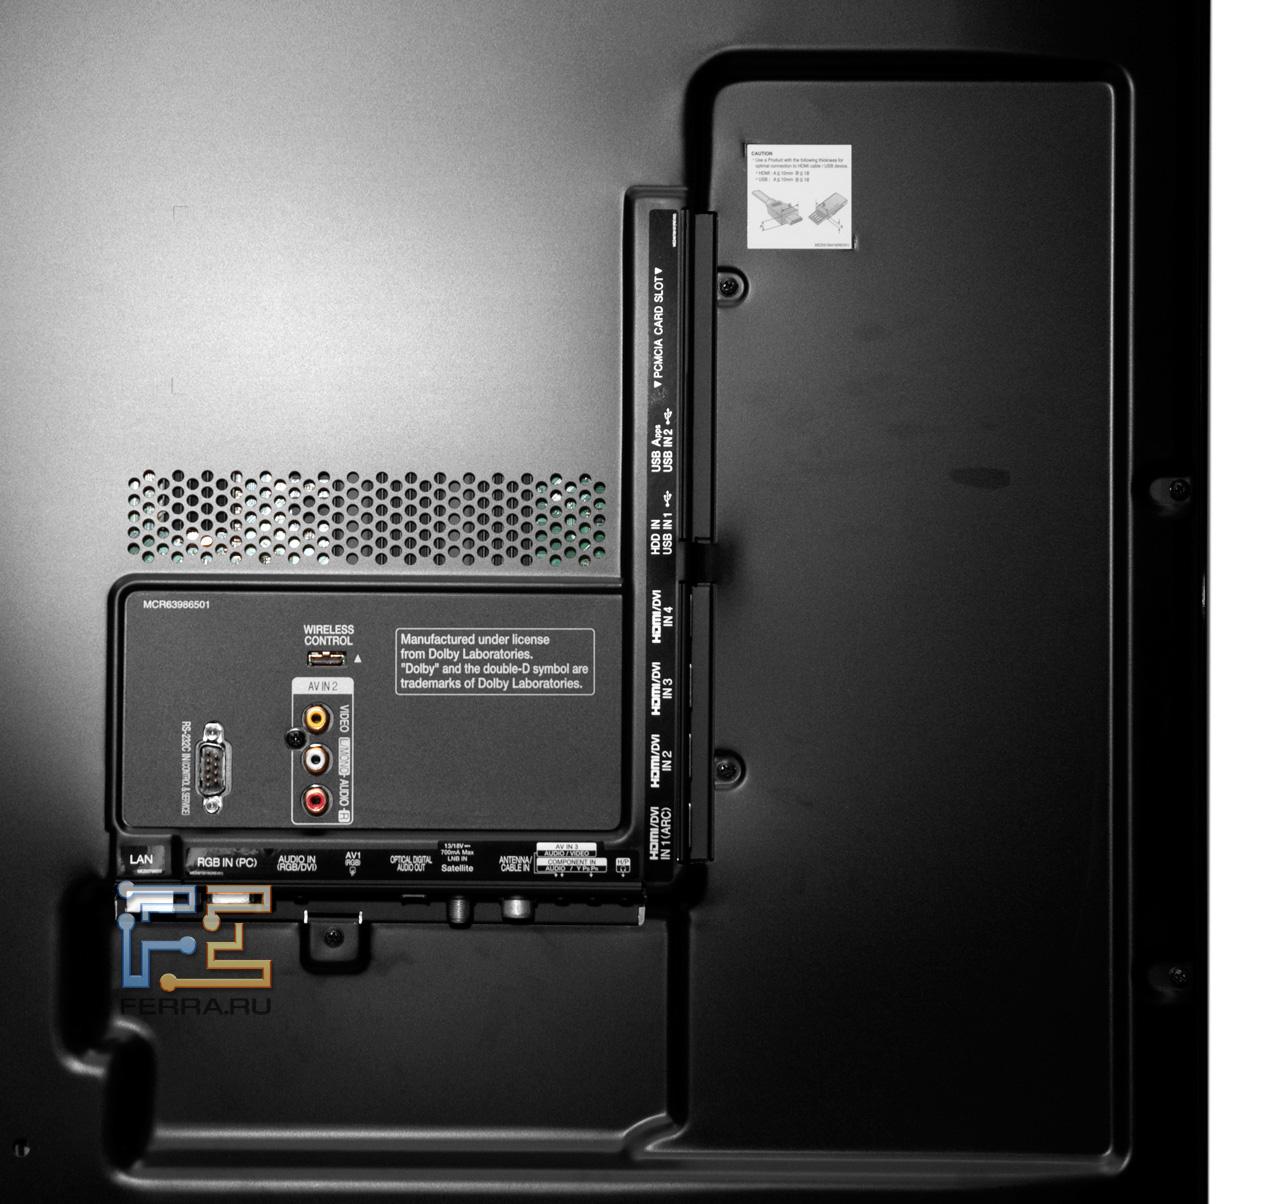 Ultra UHD 4K телевизор LG 43UH610V характеристики обзоры